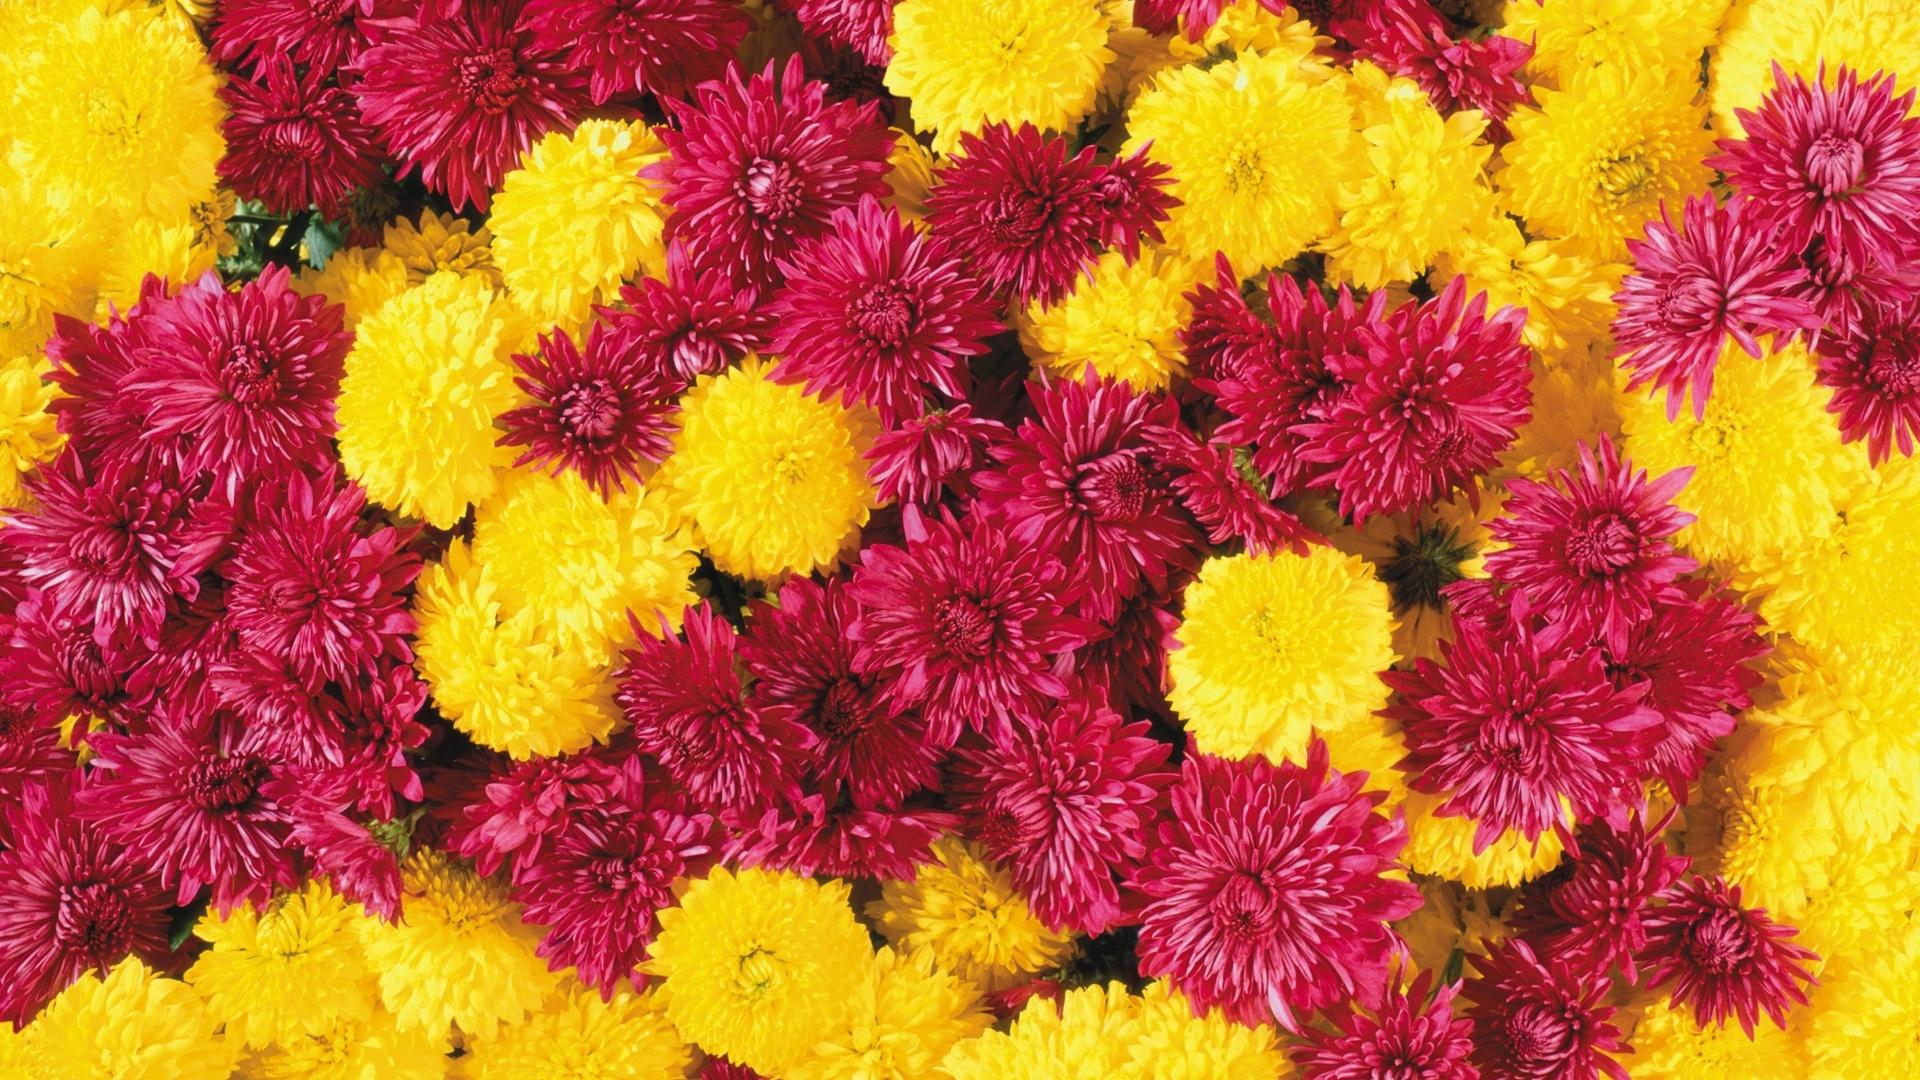 25 HD Flowers Wallpapers 1920x1080